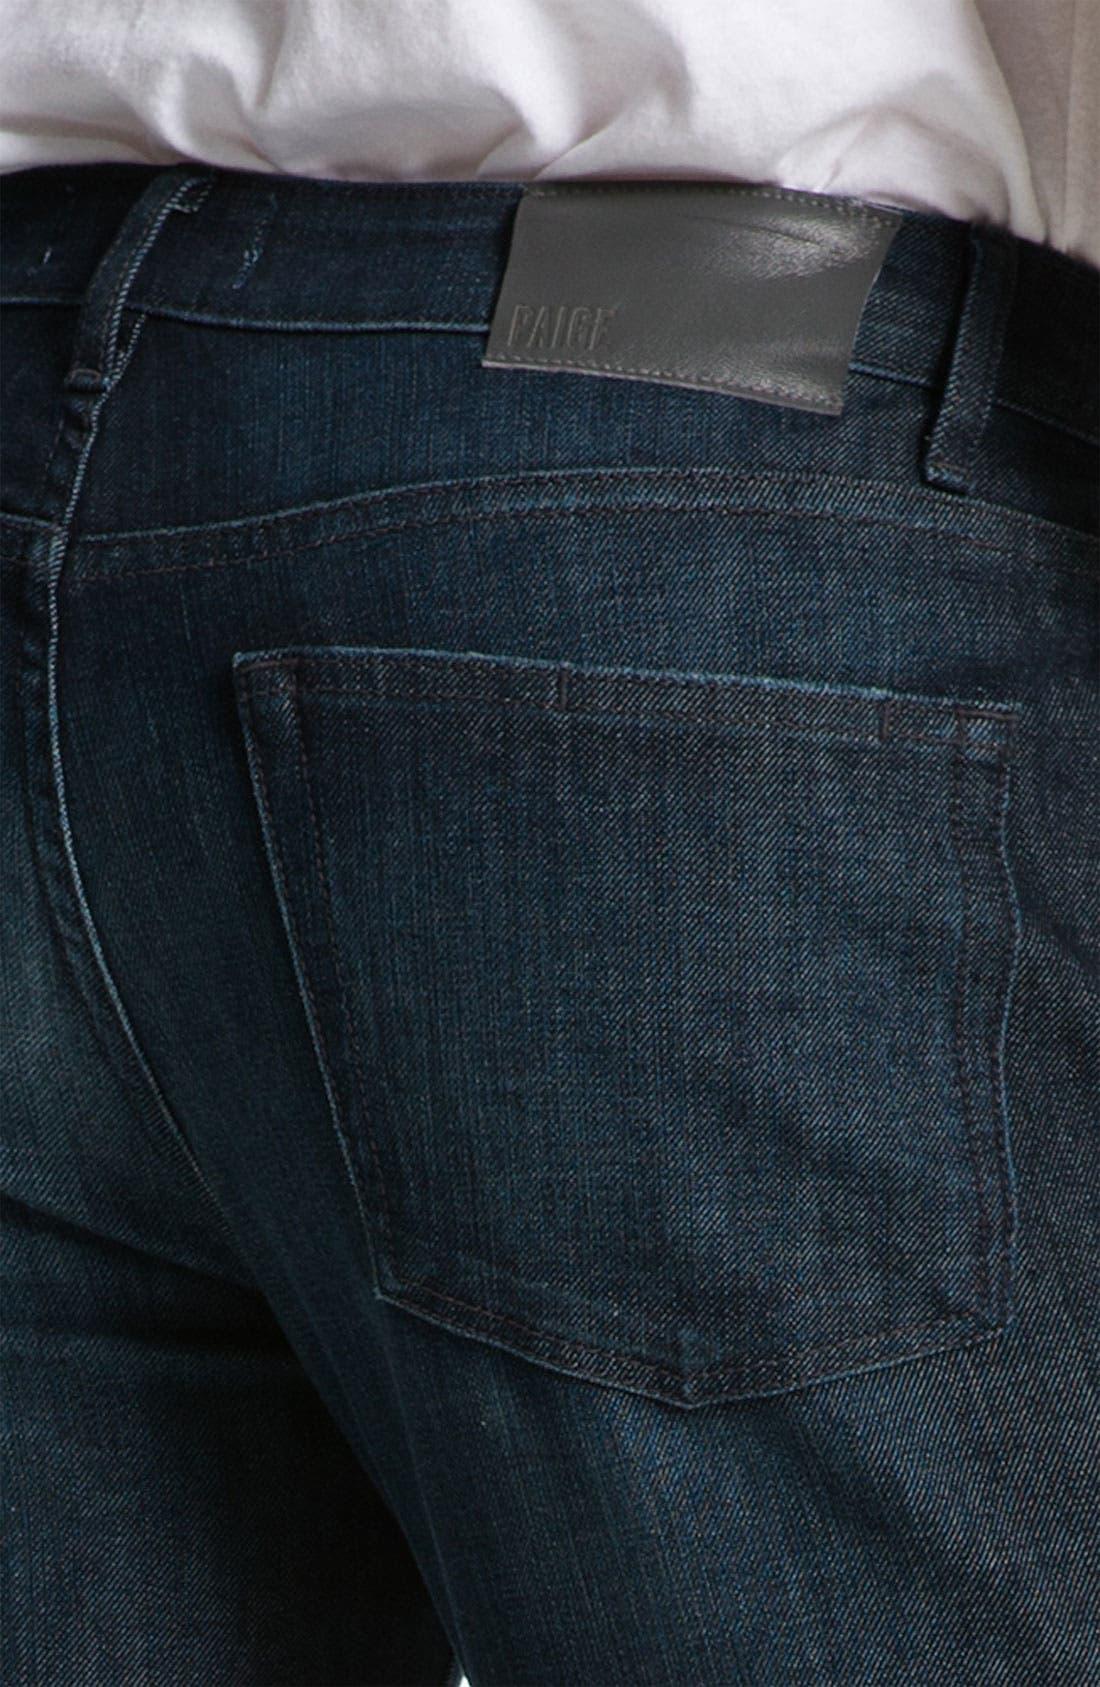 Alternate Image 4  - PAIGE 'Normandie' Slim Straight Leg Jeans (Warrior)